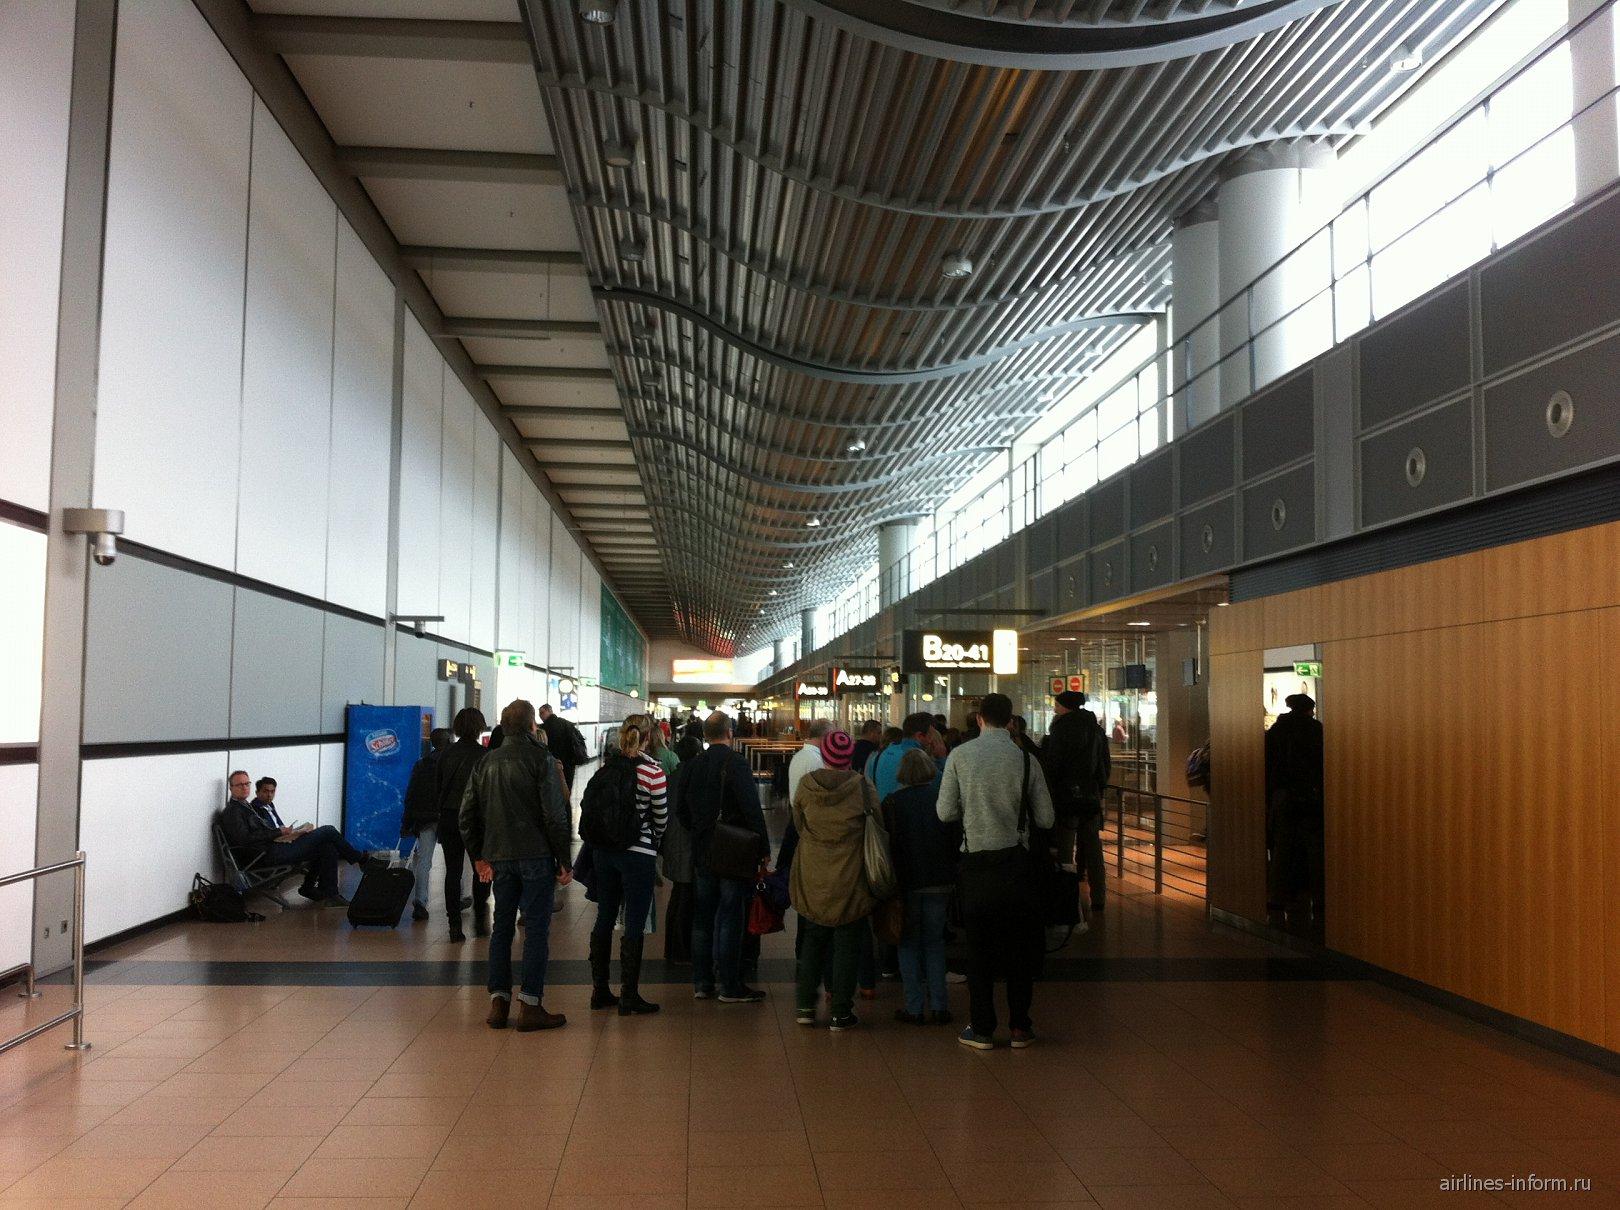 Выходы на посадку B в терминале 1 аэропорта Гамбург